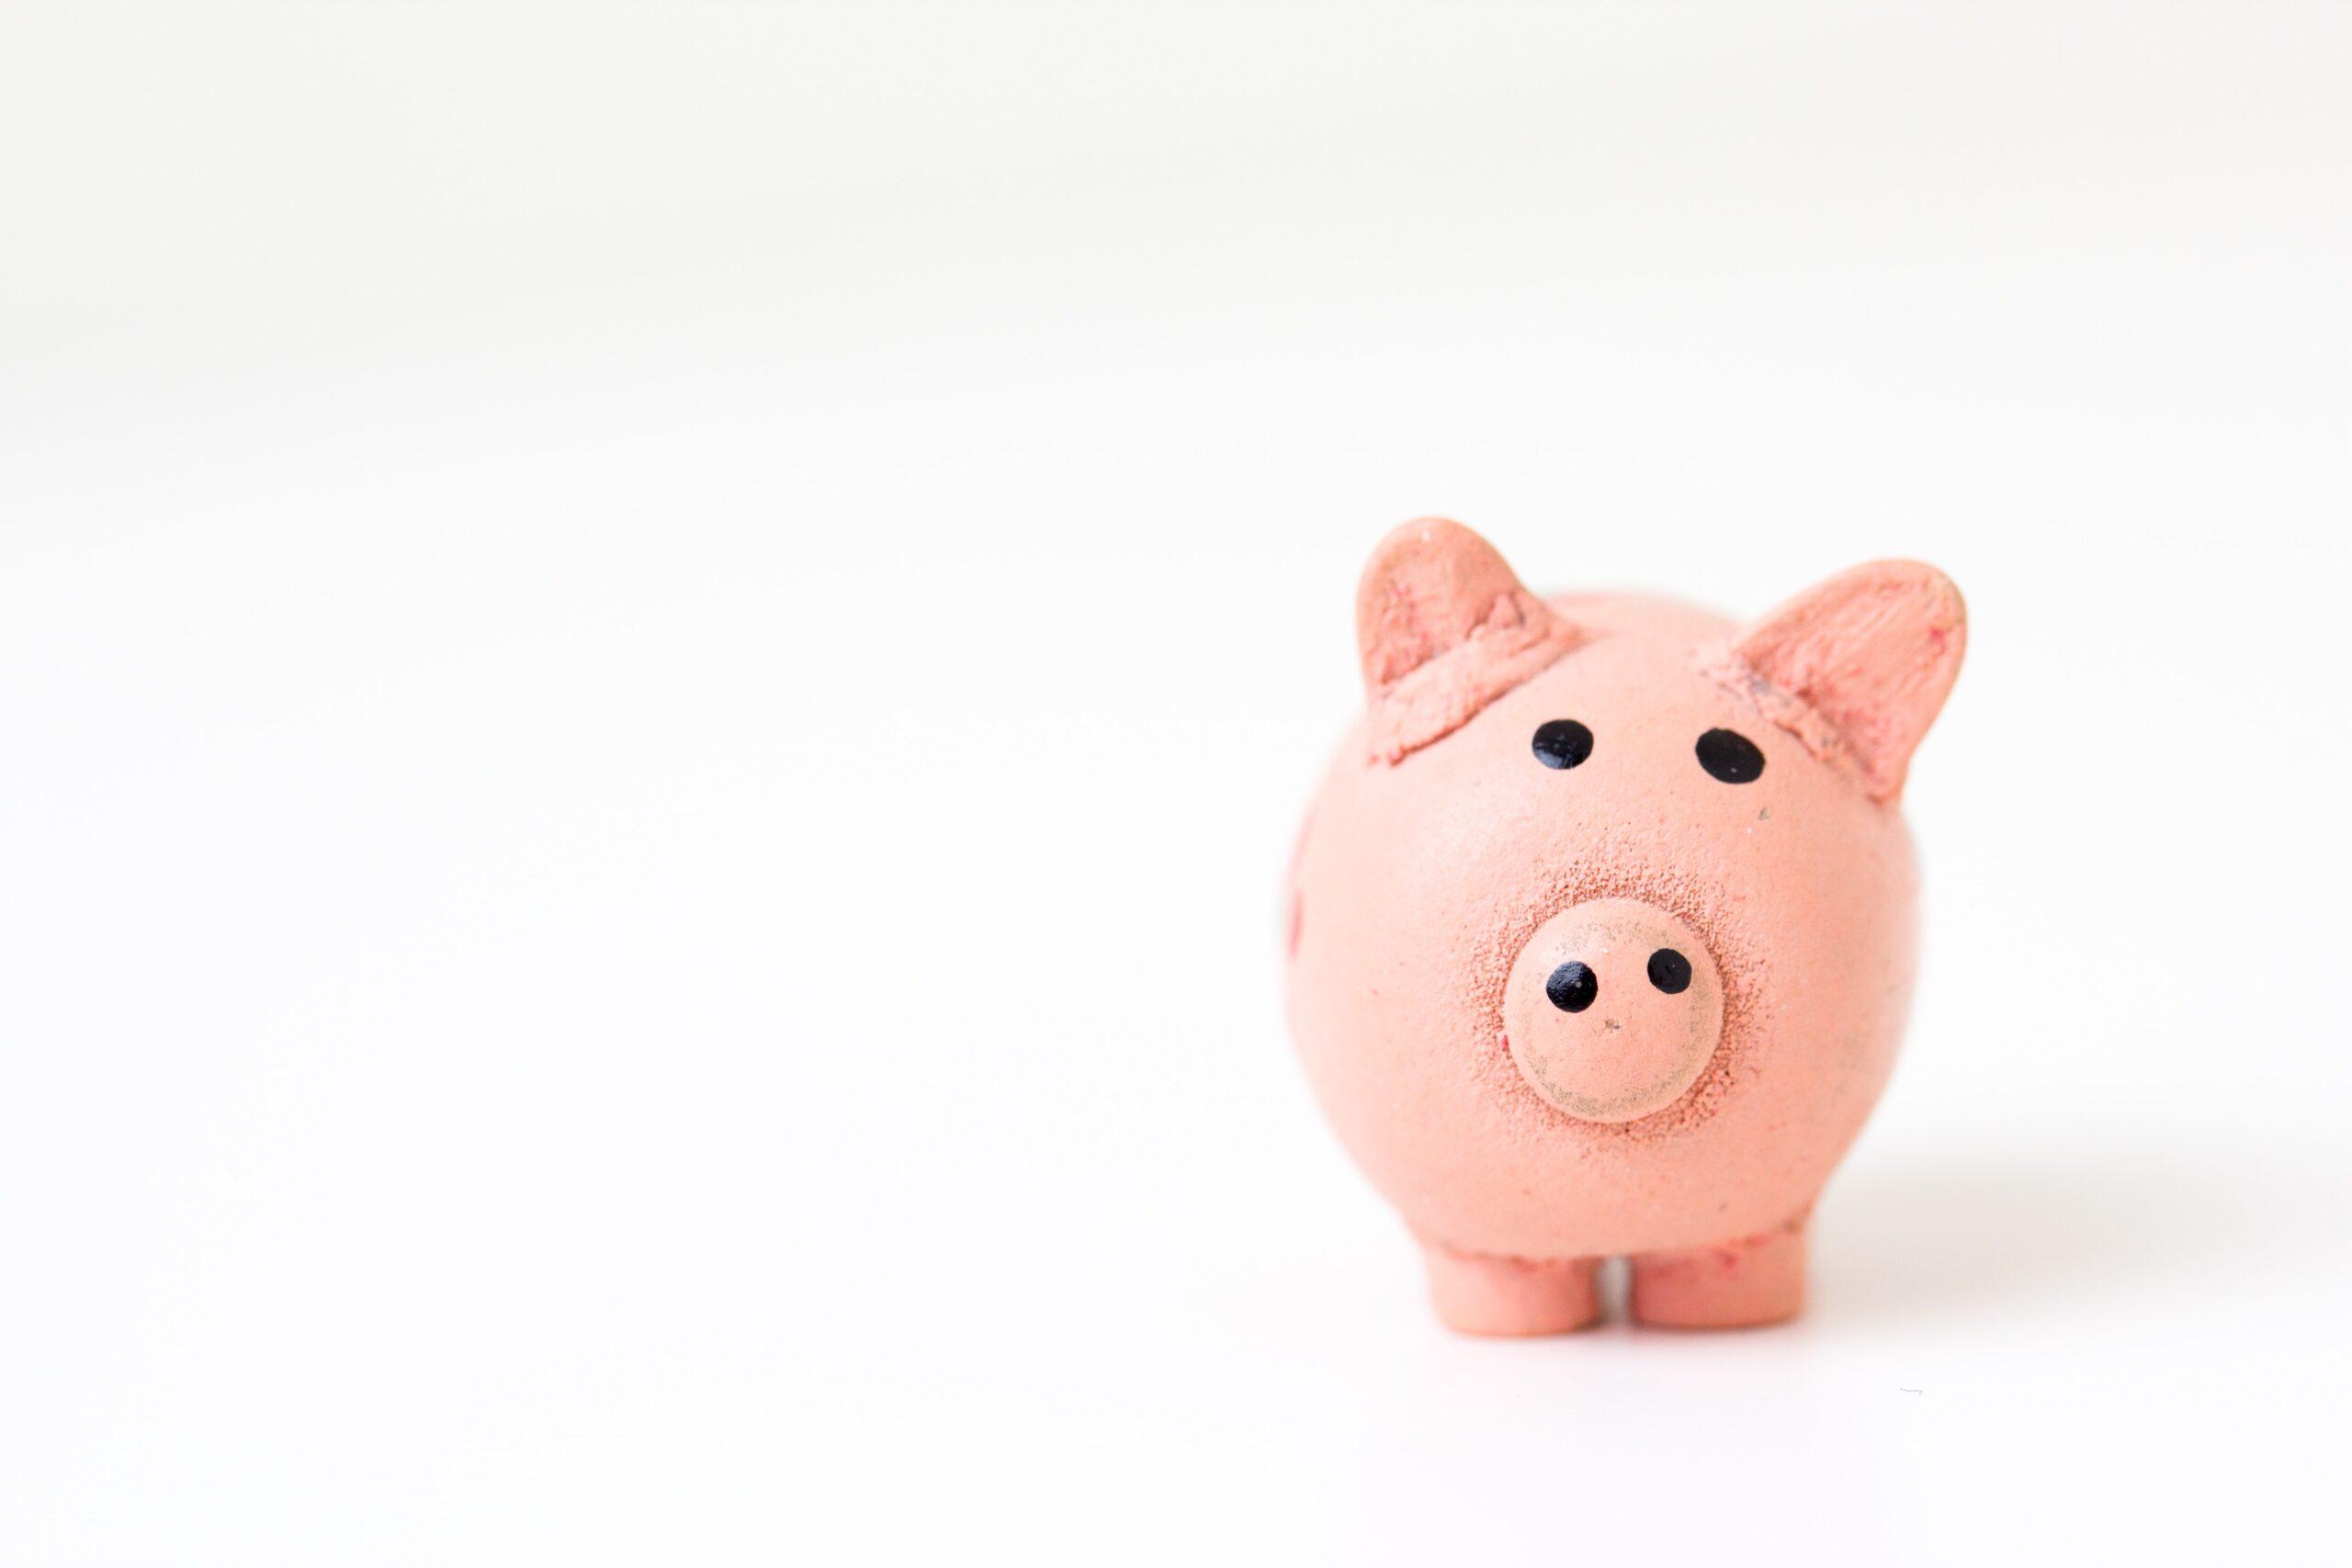 Stiller and McPheters Single Family Office Invest in Till Financial